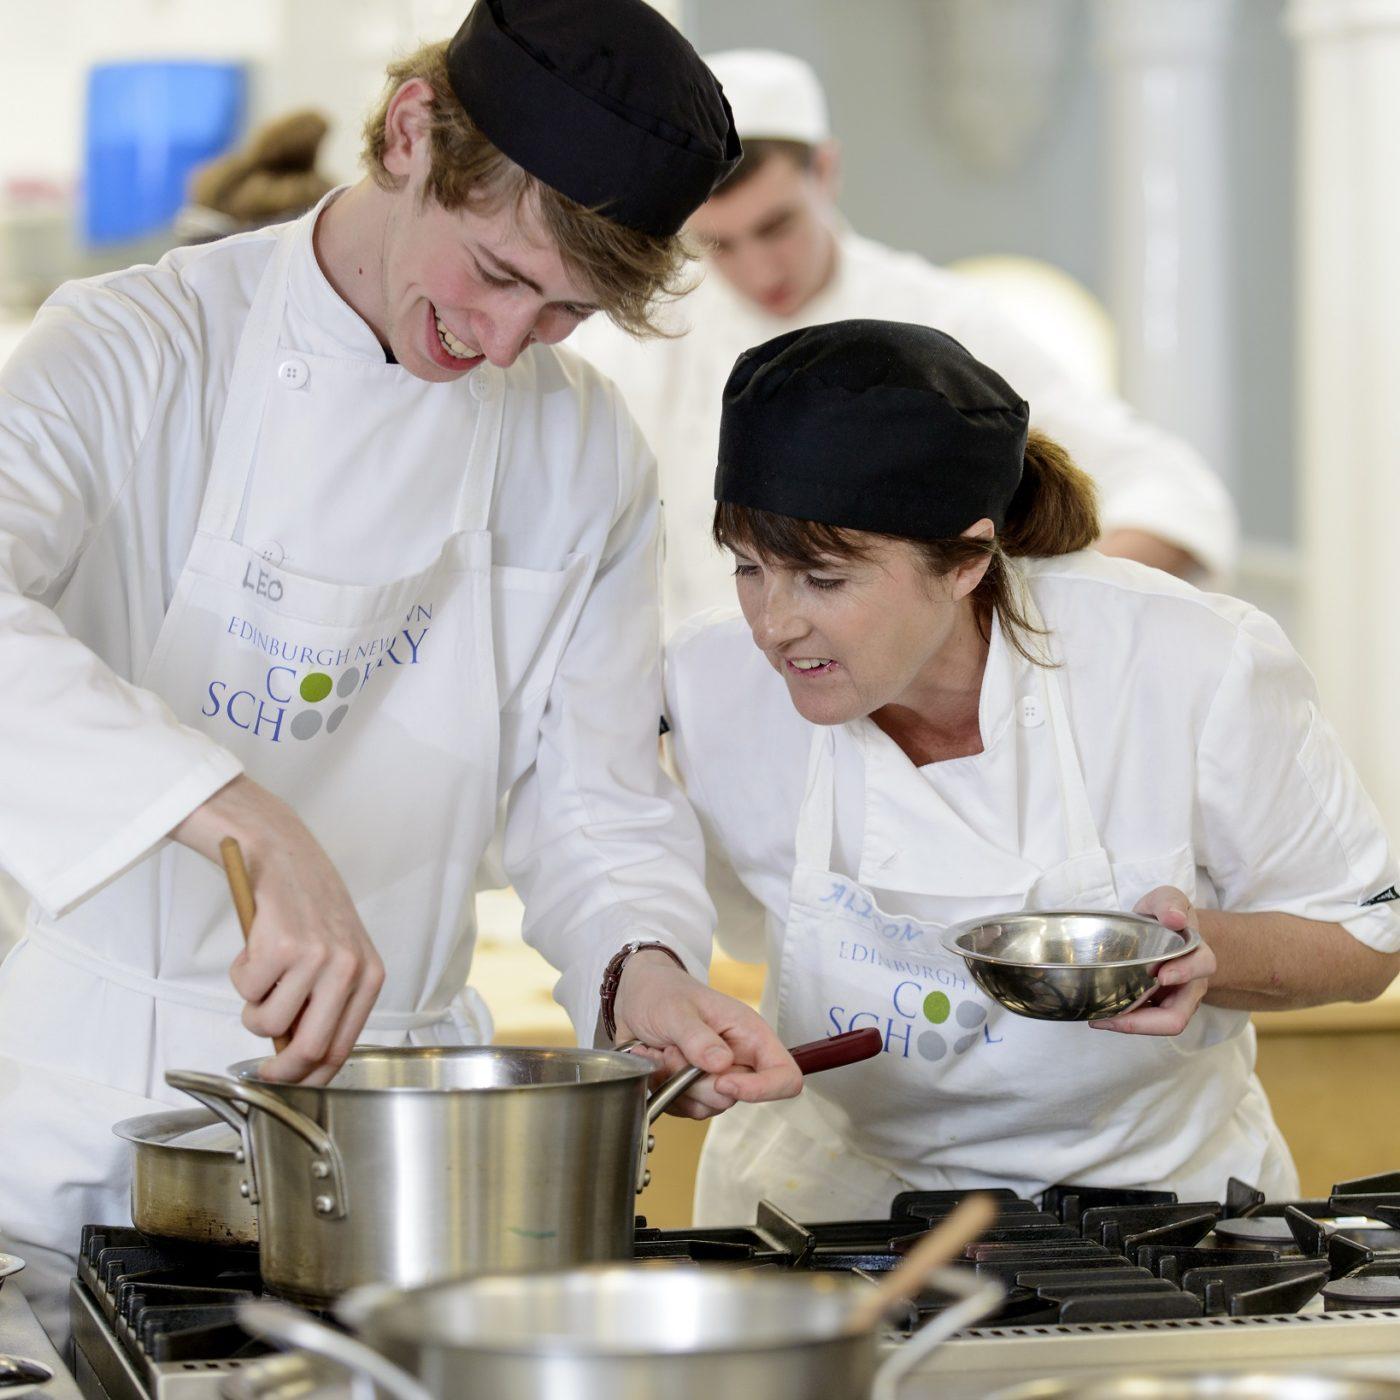 chef shortage, Edinburgh, Scotland